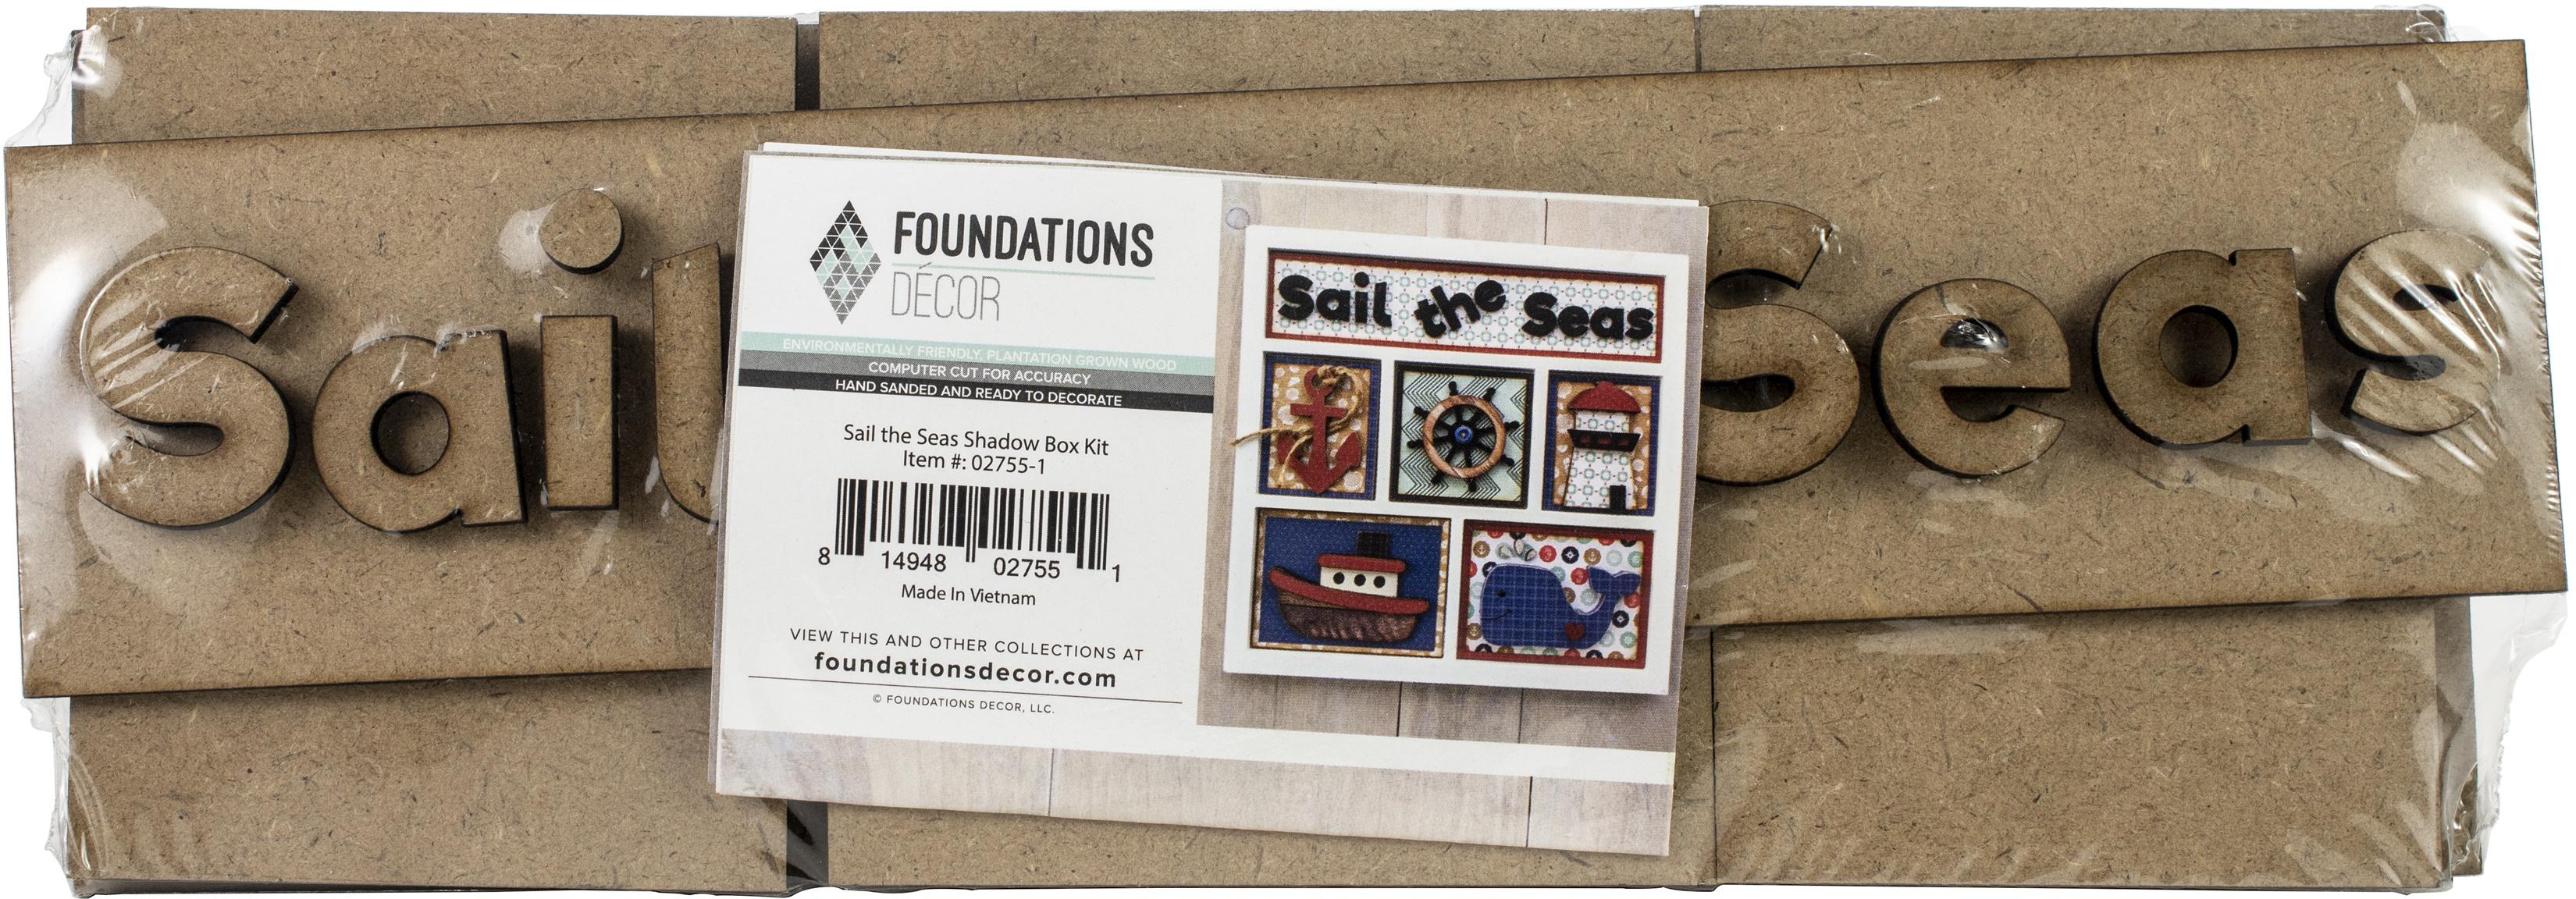 Foundations Decor Shadow Box Kit-Sail The Seas